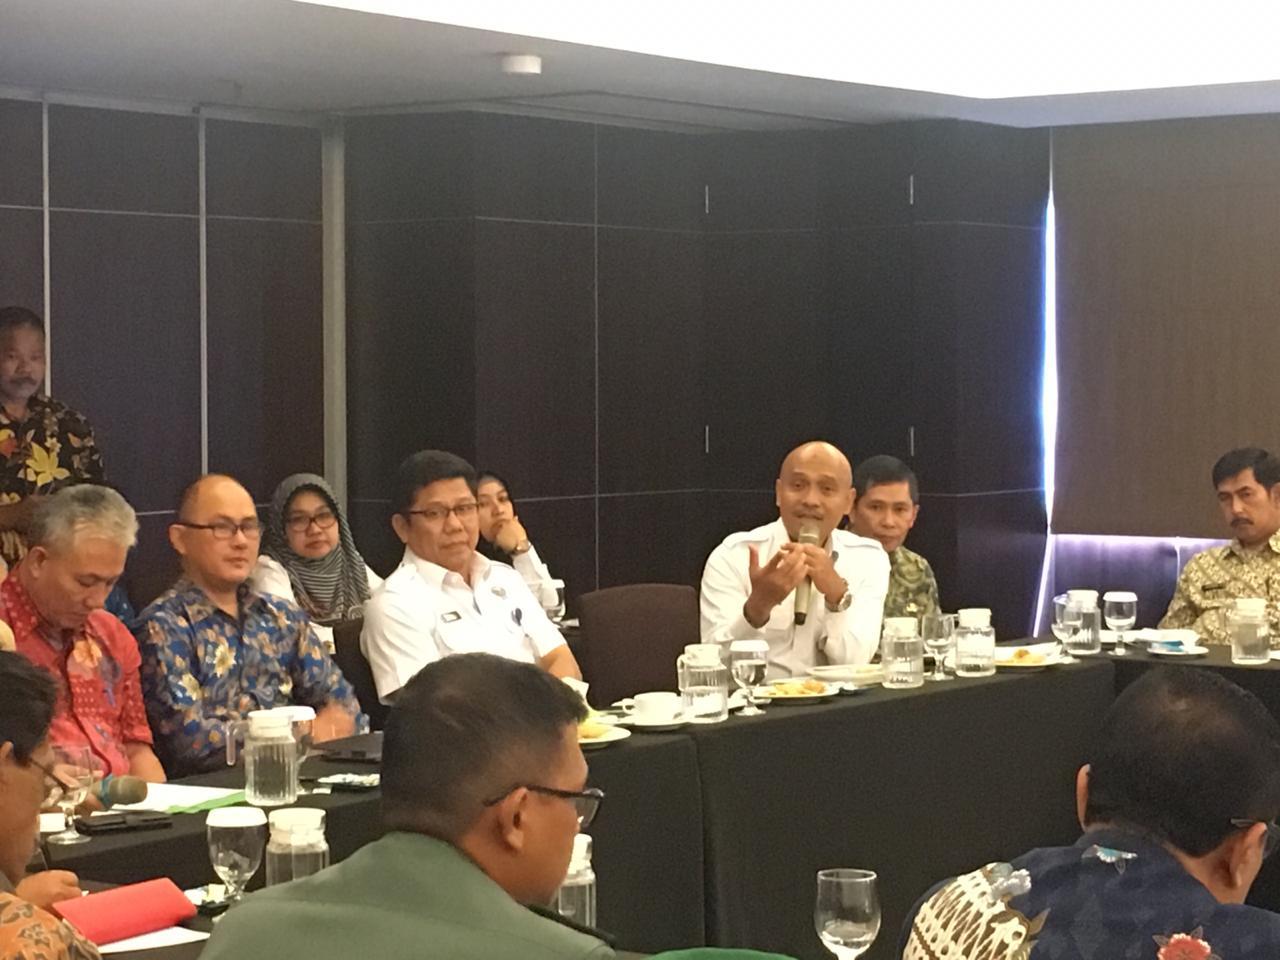 BNNP Jabar Bersama Instansi Pemerintah Laksanakan Rapat Koordinasi Terkait Pemberdayaan Masyarakat